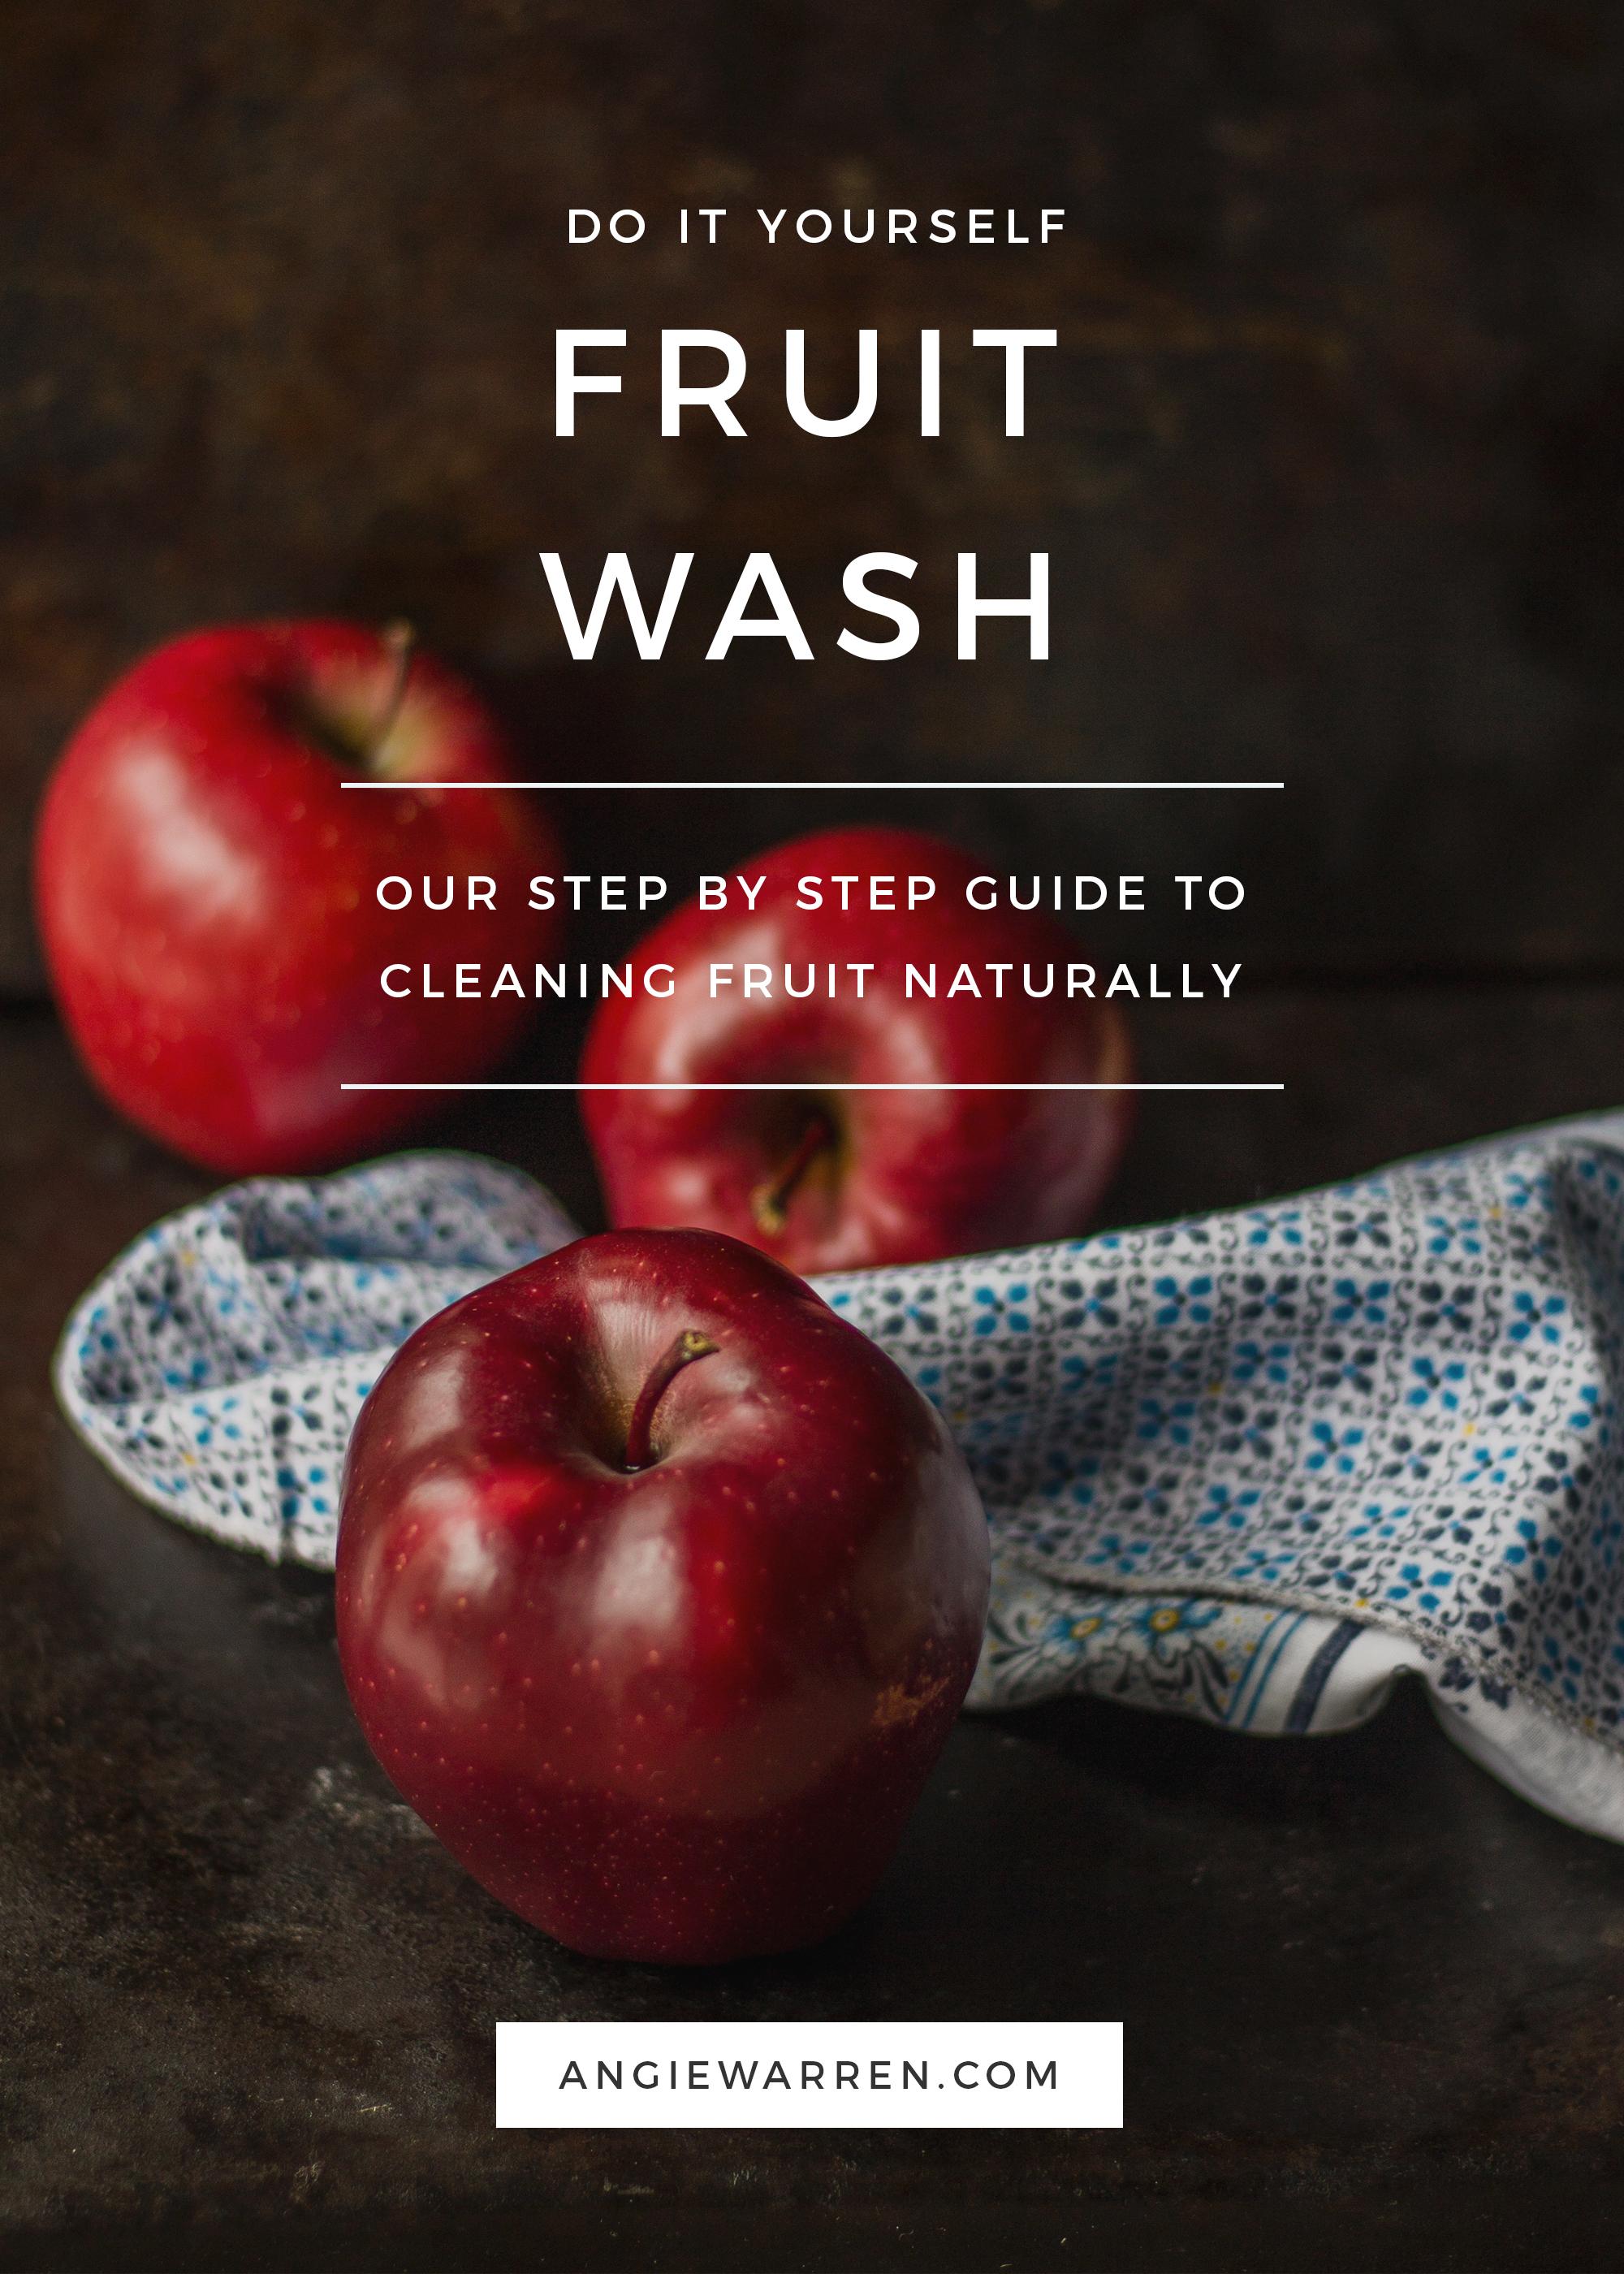 DIY NATURAL FRUIT CLEANER | www.angiewarren.com